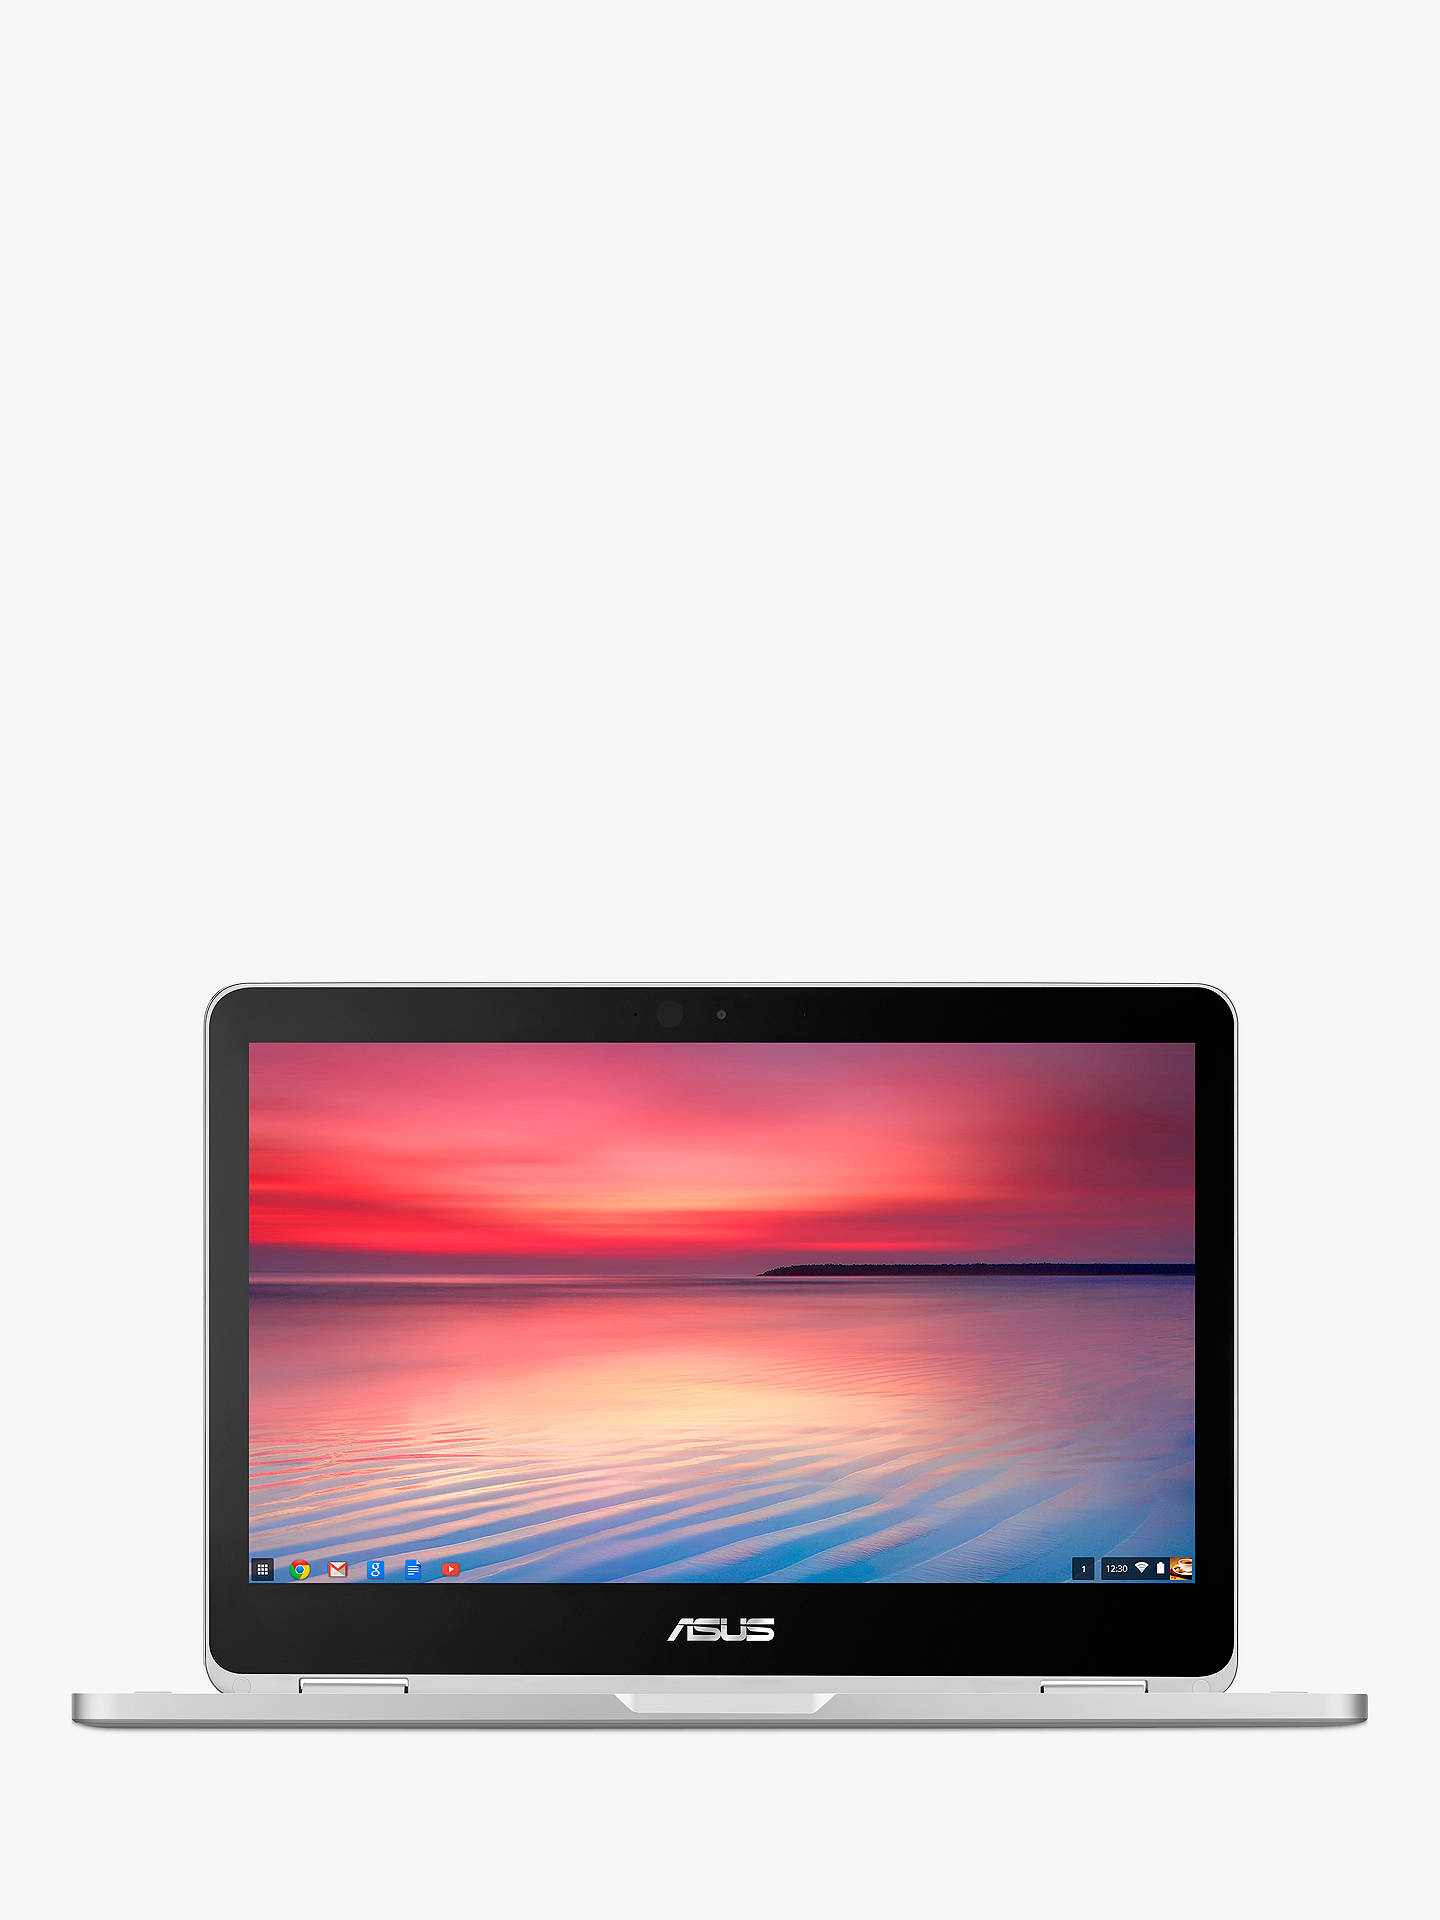 ASUS Chromebook C302ca, Intel Core M7, 4GB RAM, 64GB eMMC, 12 5